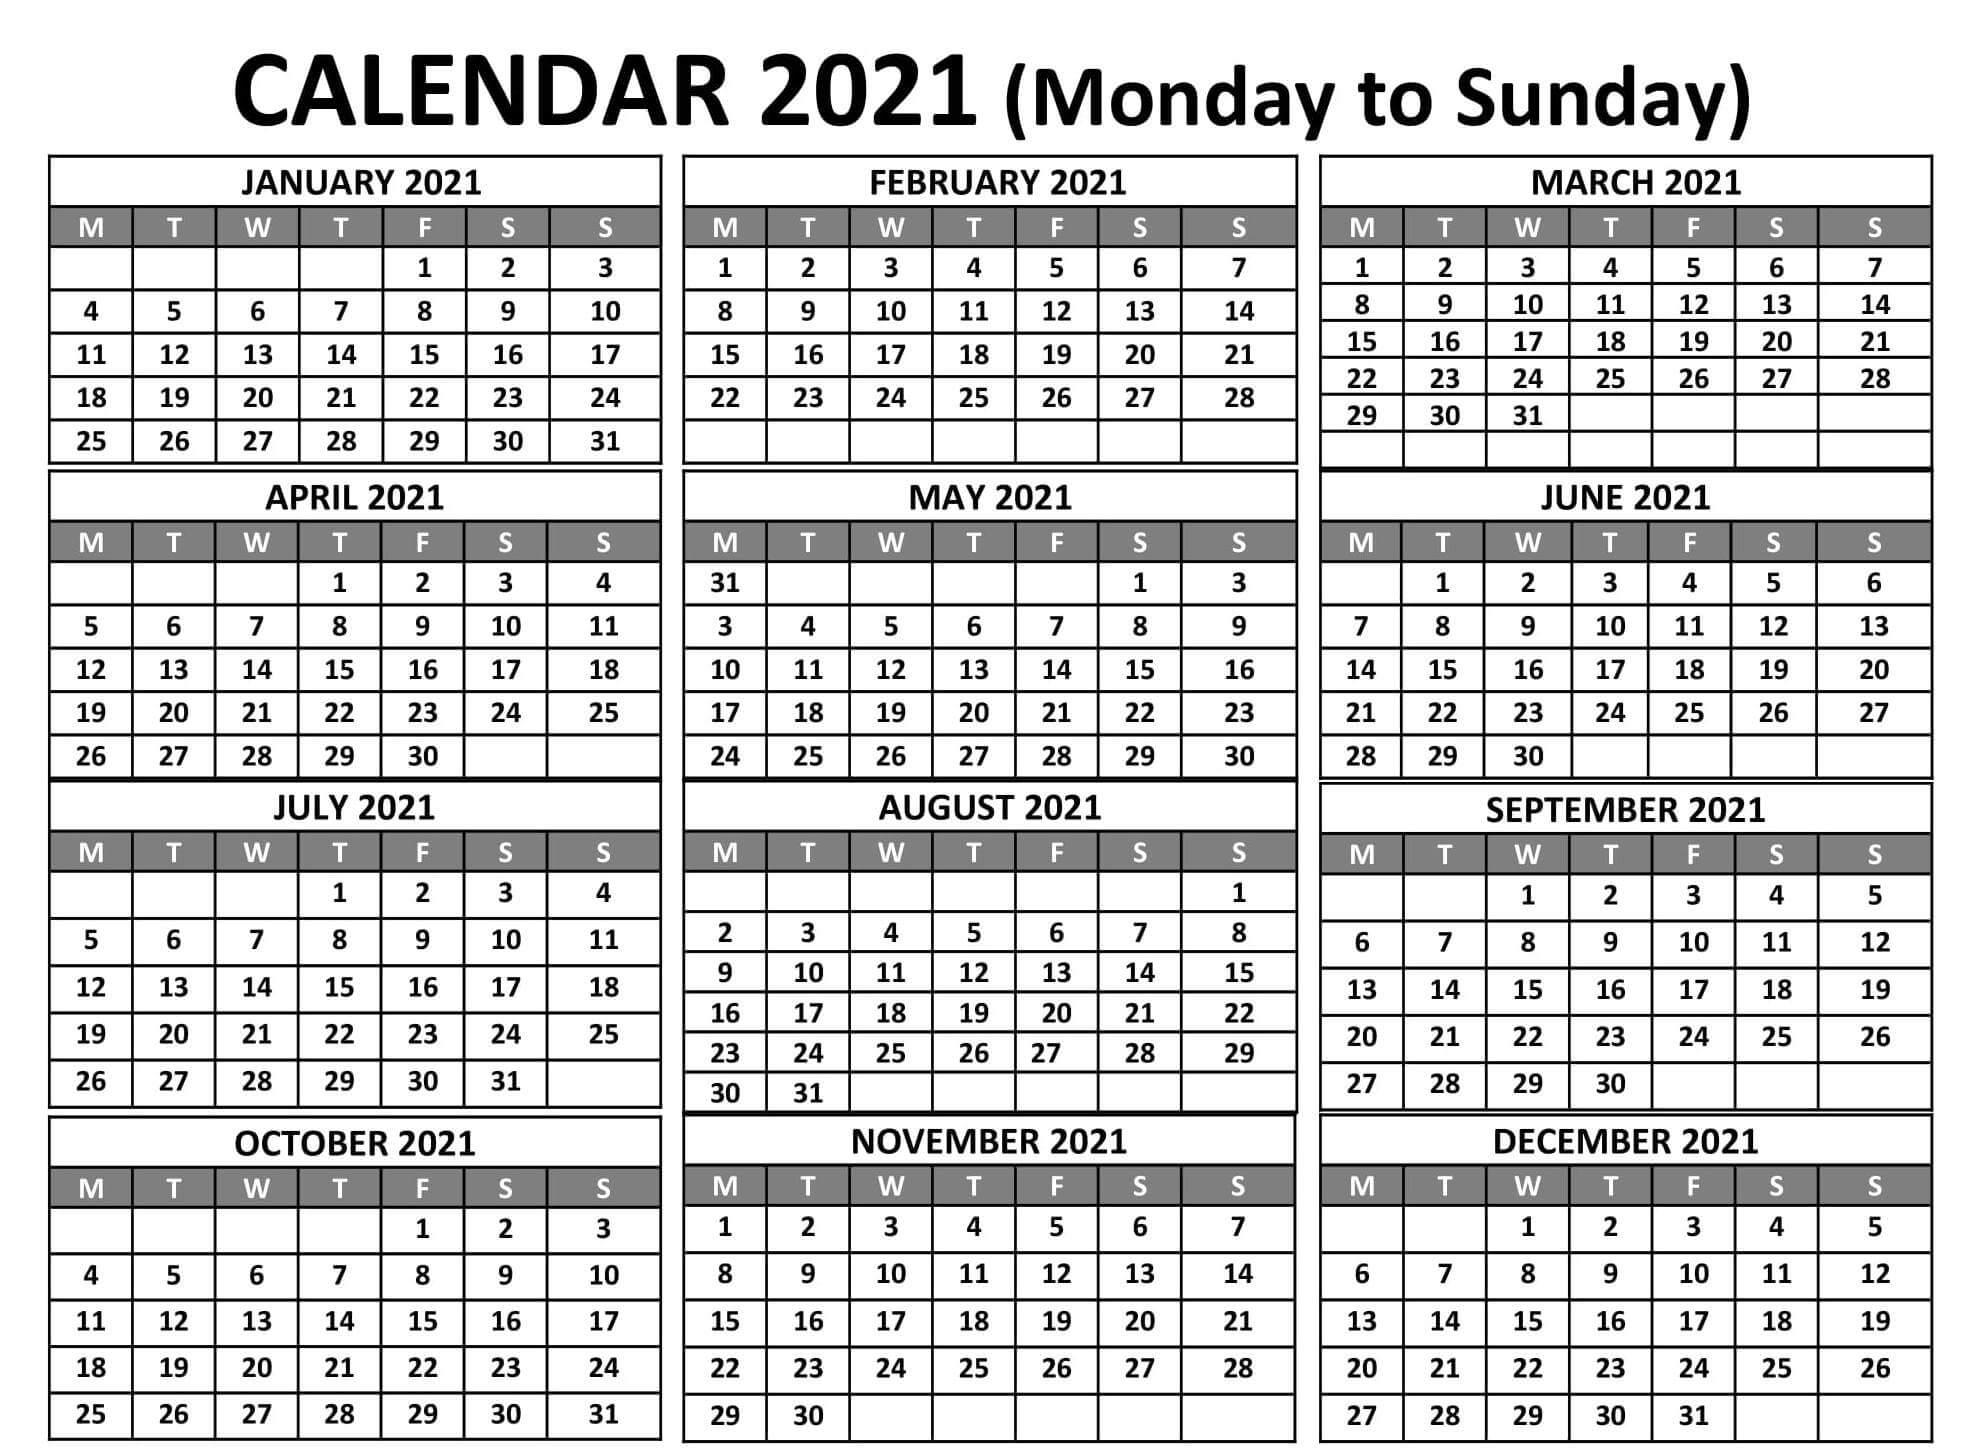 Year Calendar 2021 Monday To Sunday